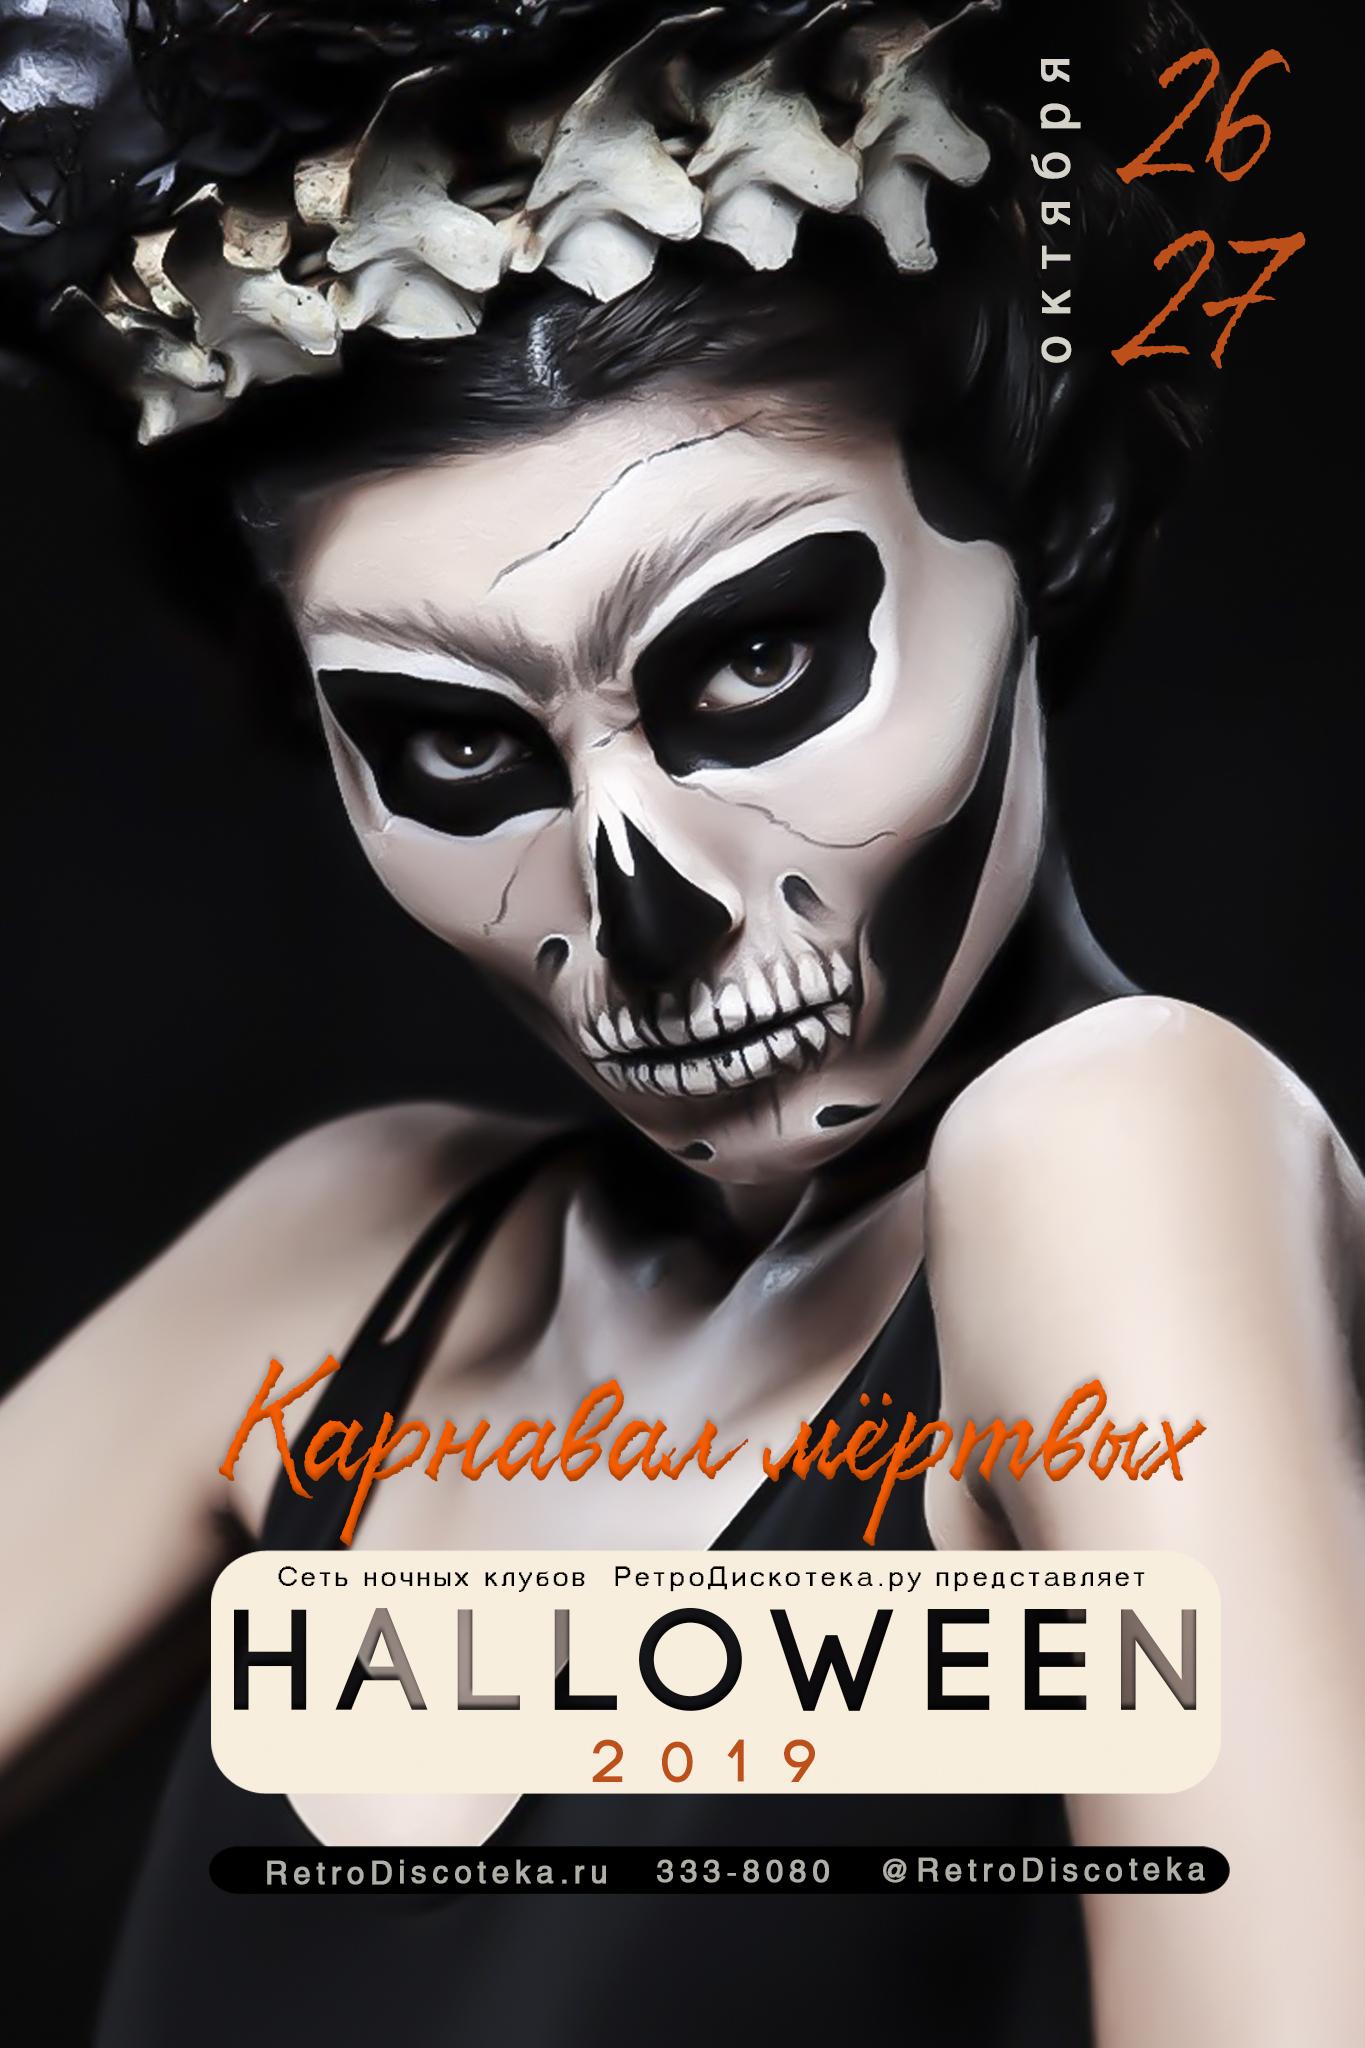 Дизайн афиши Хэллоуин 2019 для сети ночных клубов фото f_2095c6e661aa3ad7.jpg